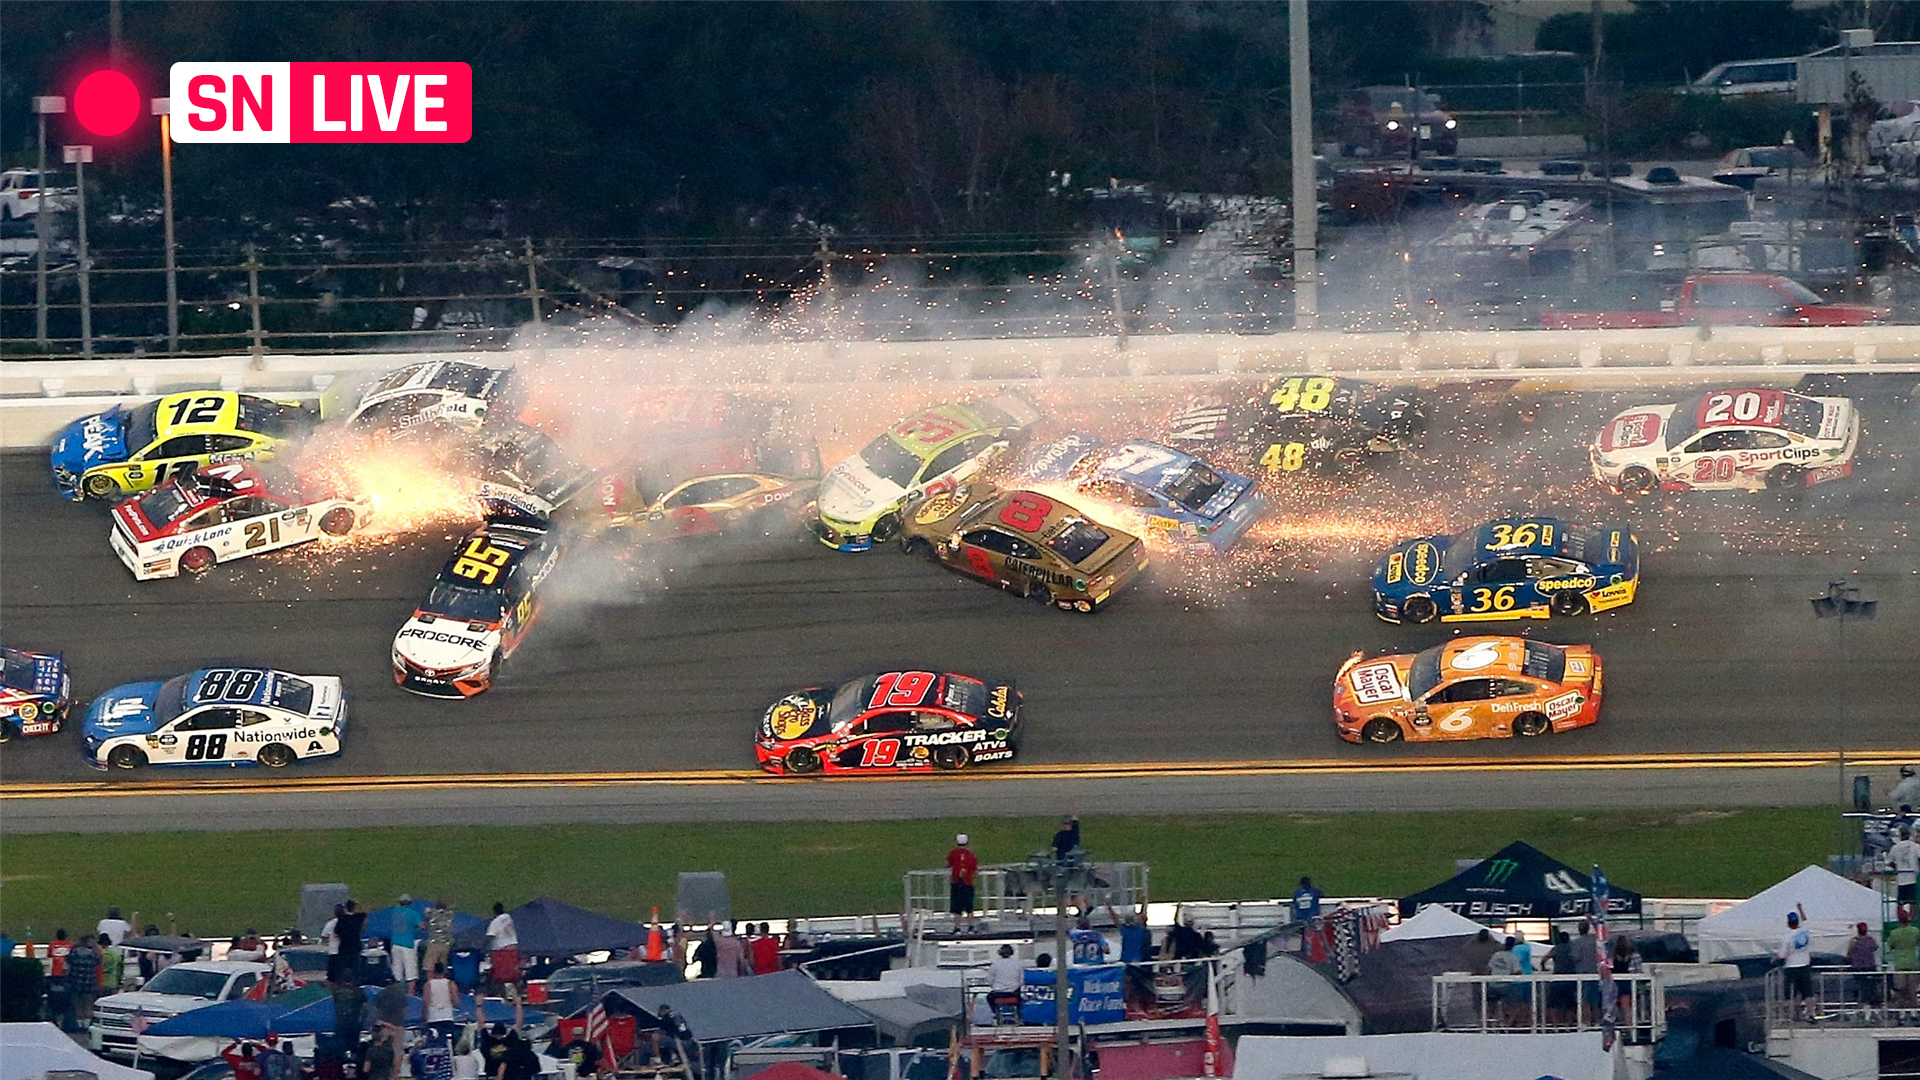 Daytona 500 results Highlights from Denny Hamlins chaotic crash 1920x1080